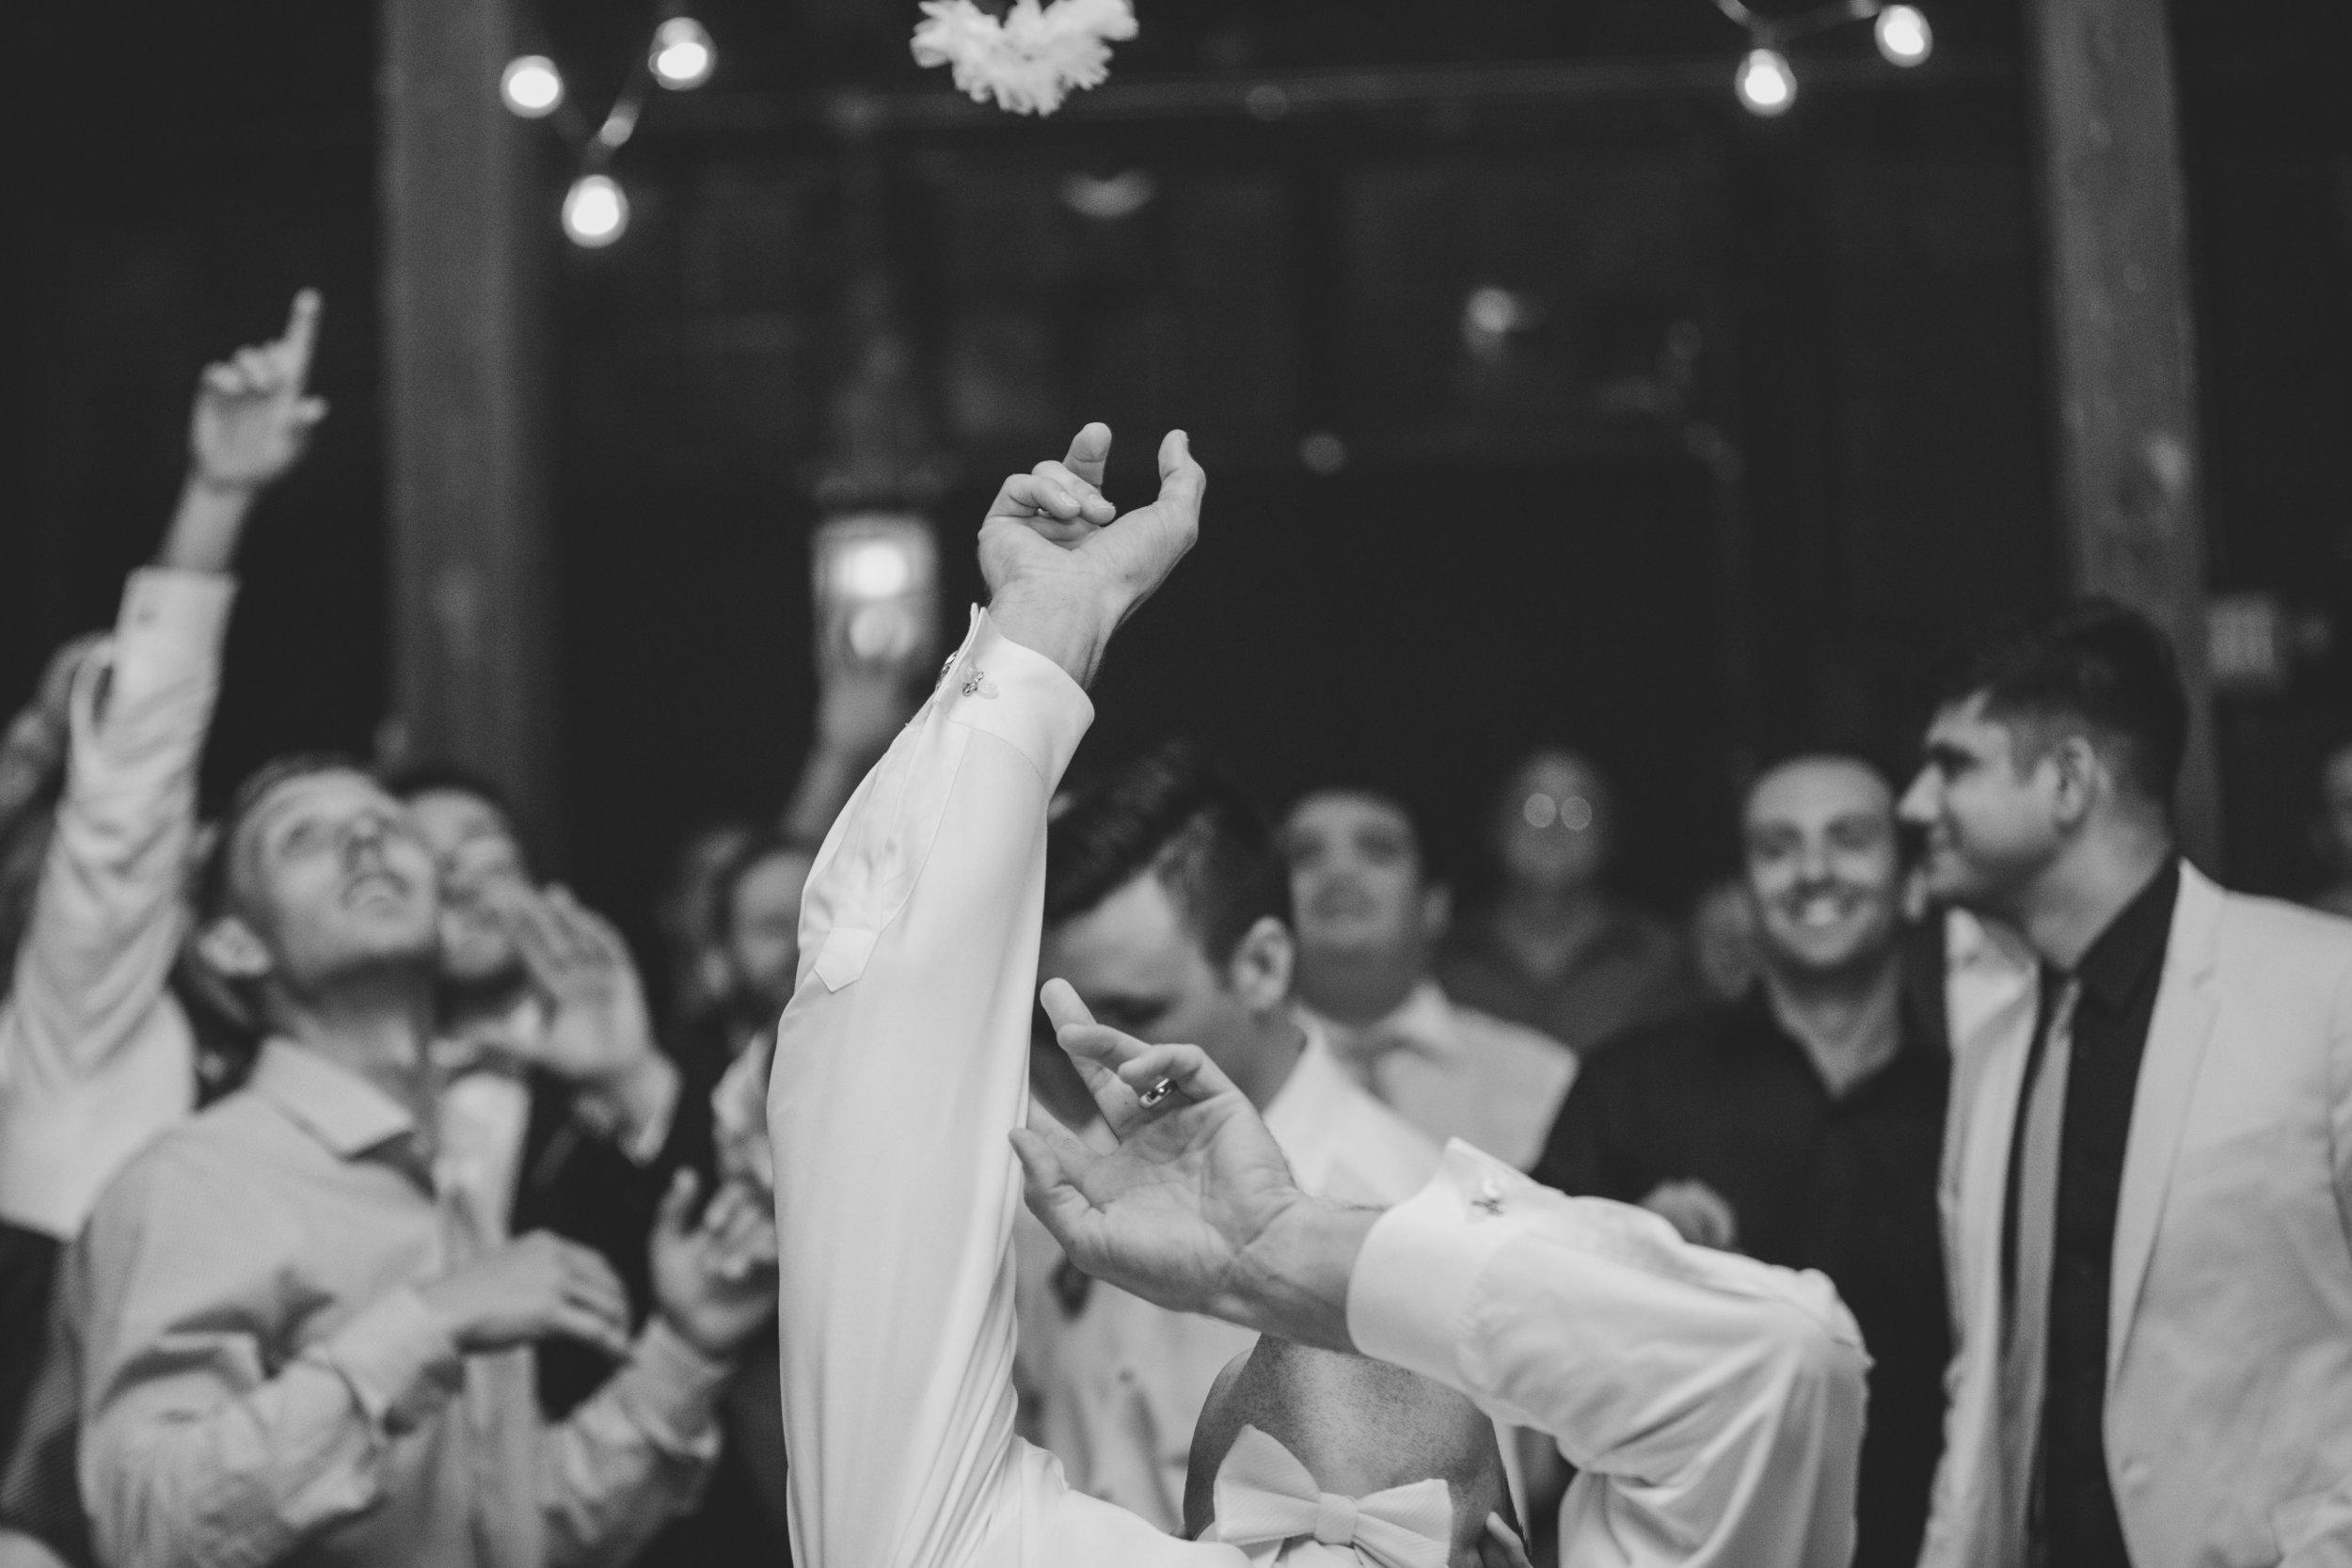 ATGI_Magali & Josh Wedding1_2S8A2555.jpg